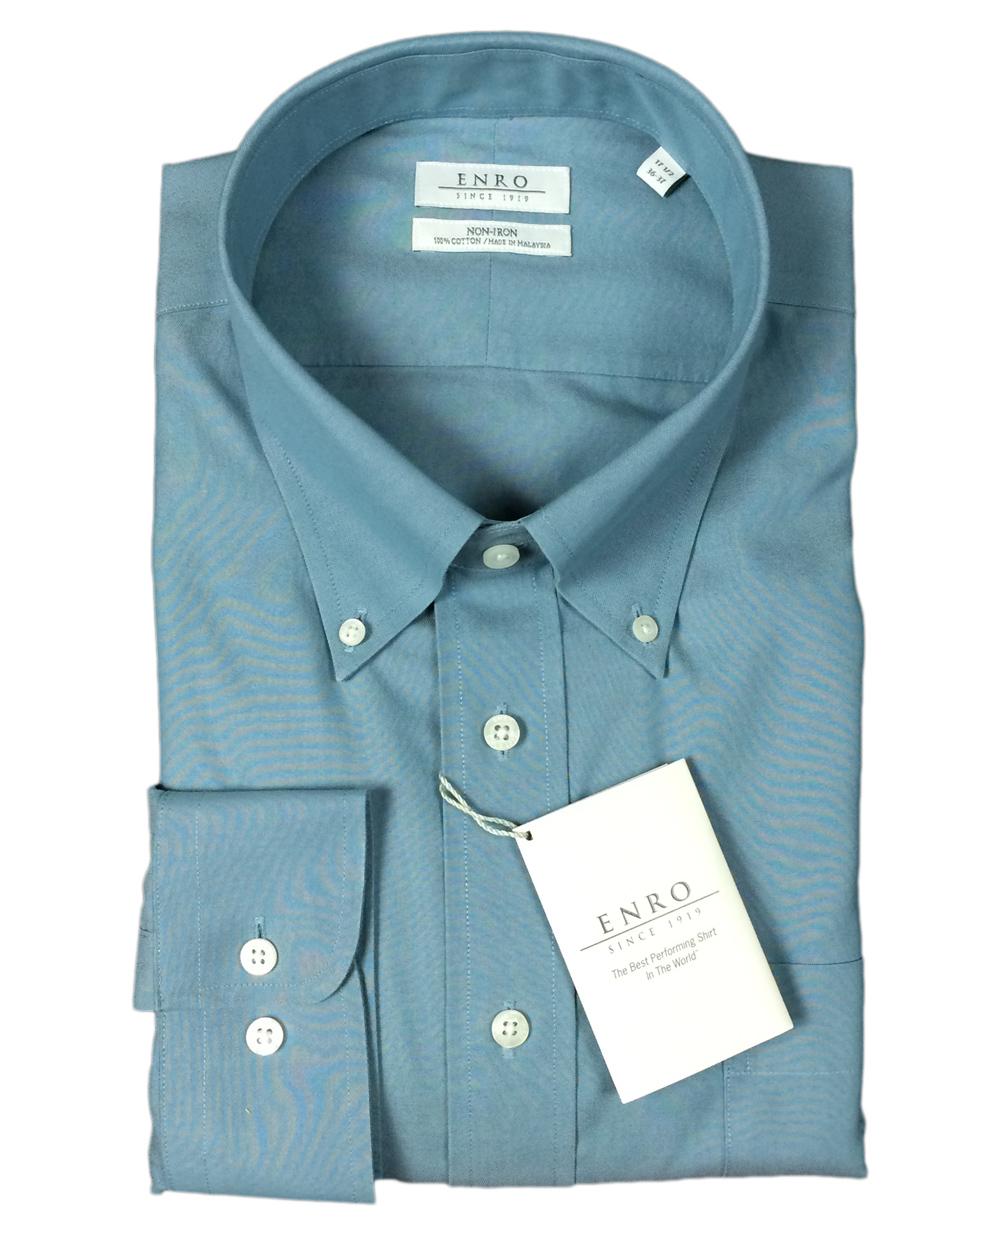 Enro men 39 s 100 cotton non iron button down dress shirt ebay for No iron cotton shirts